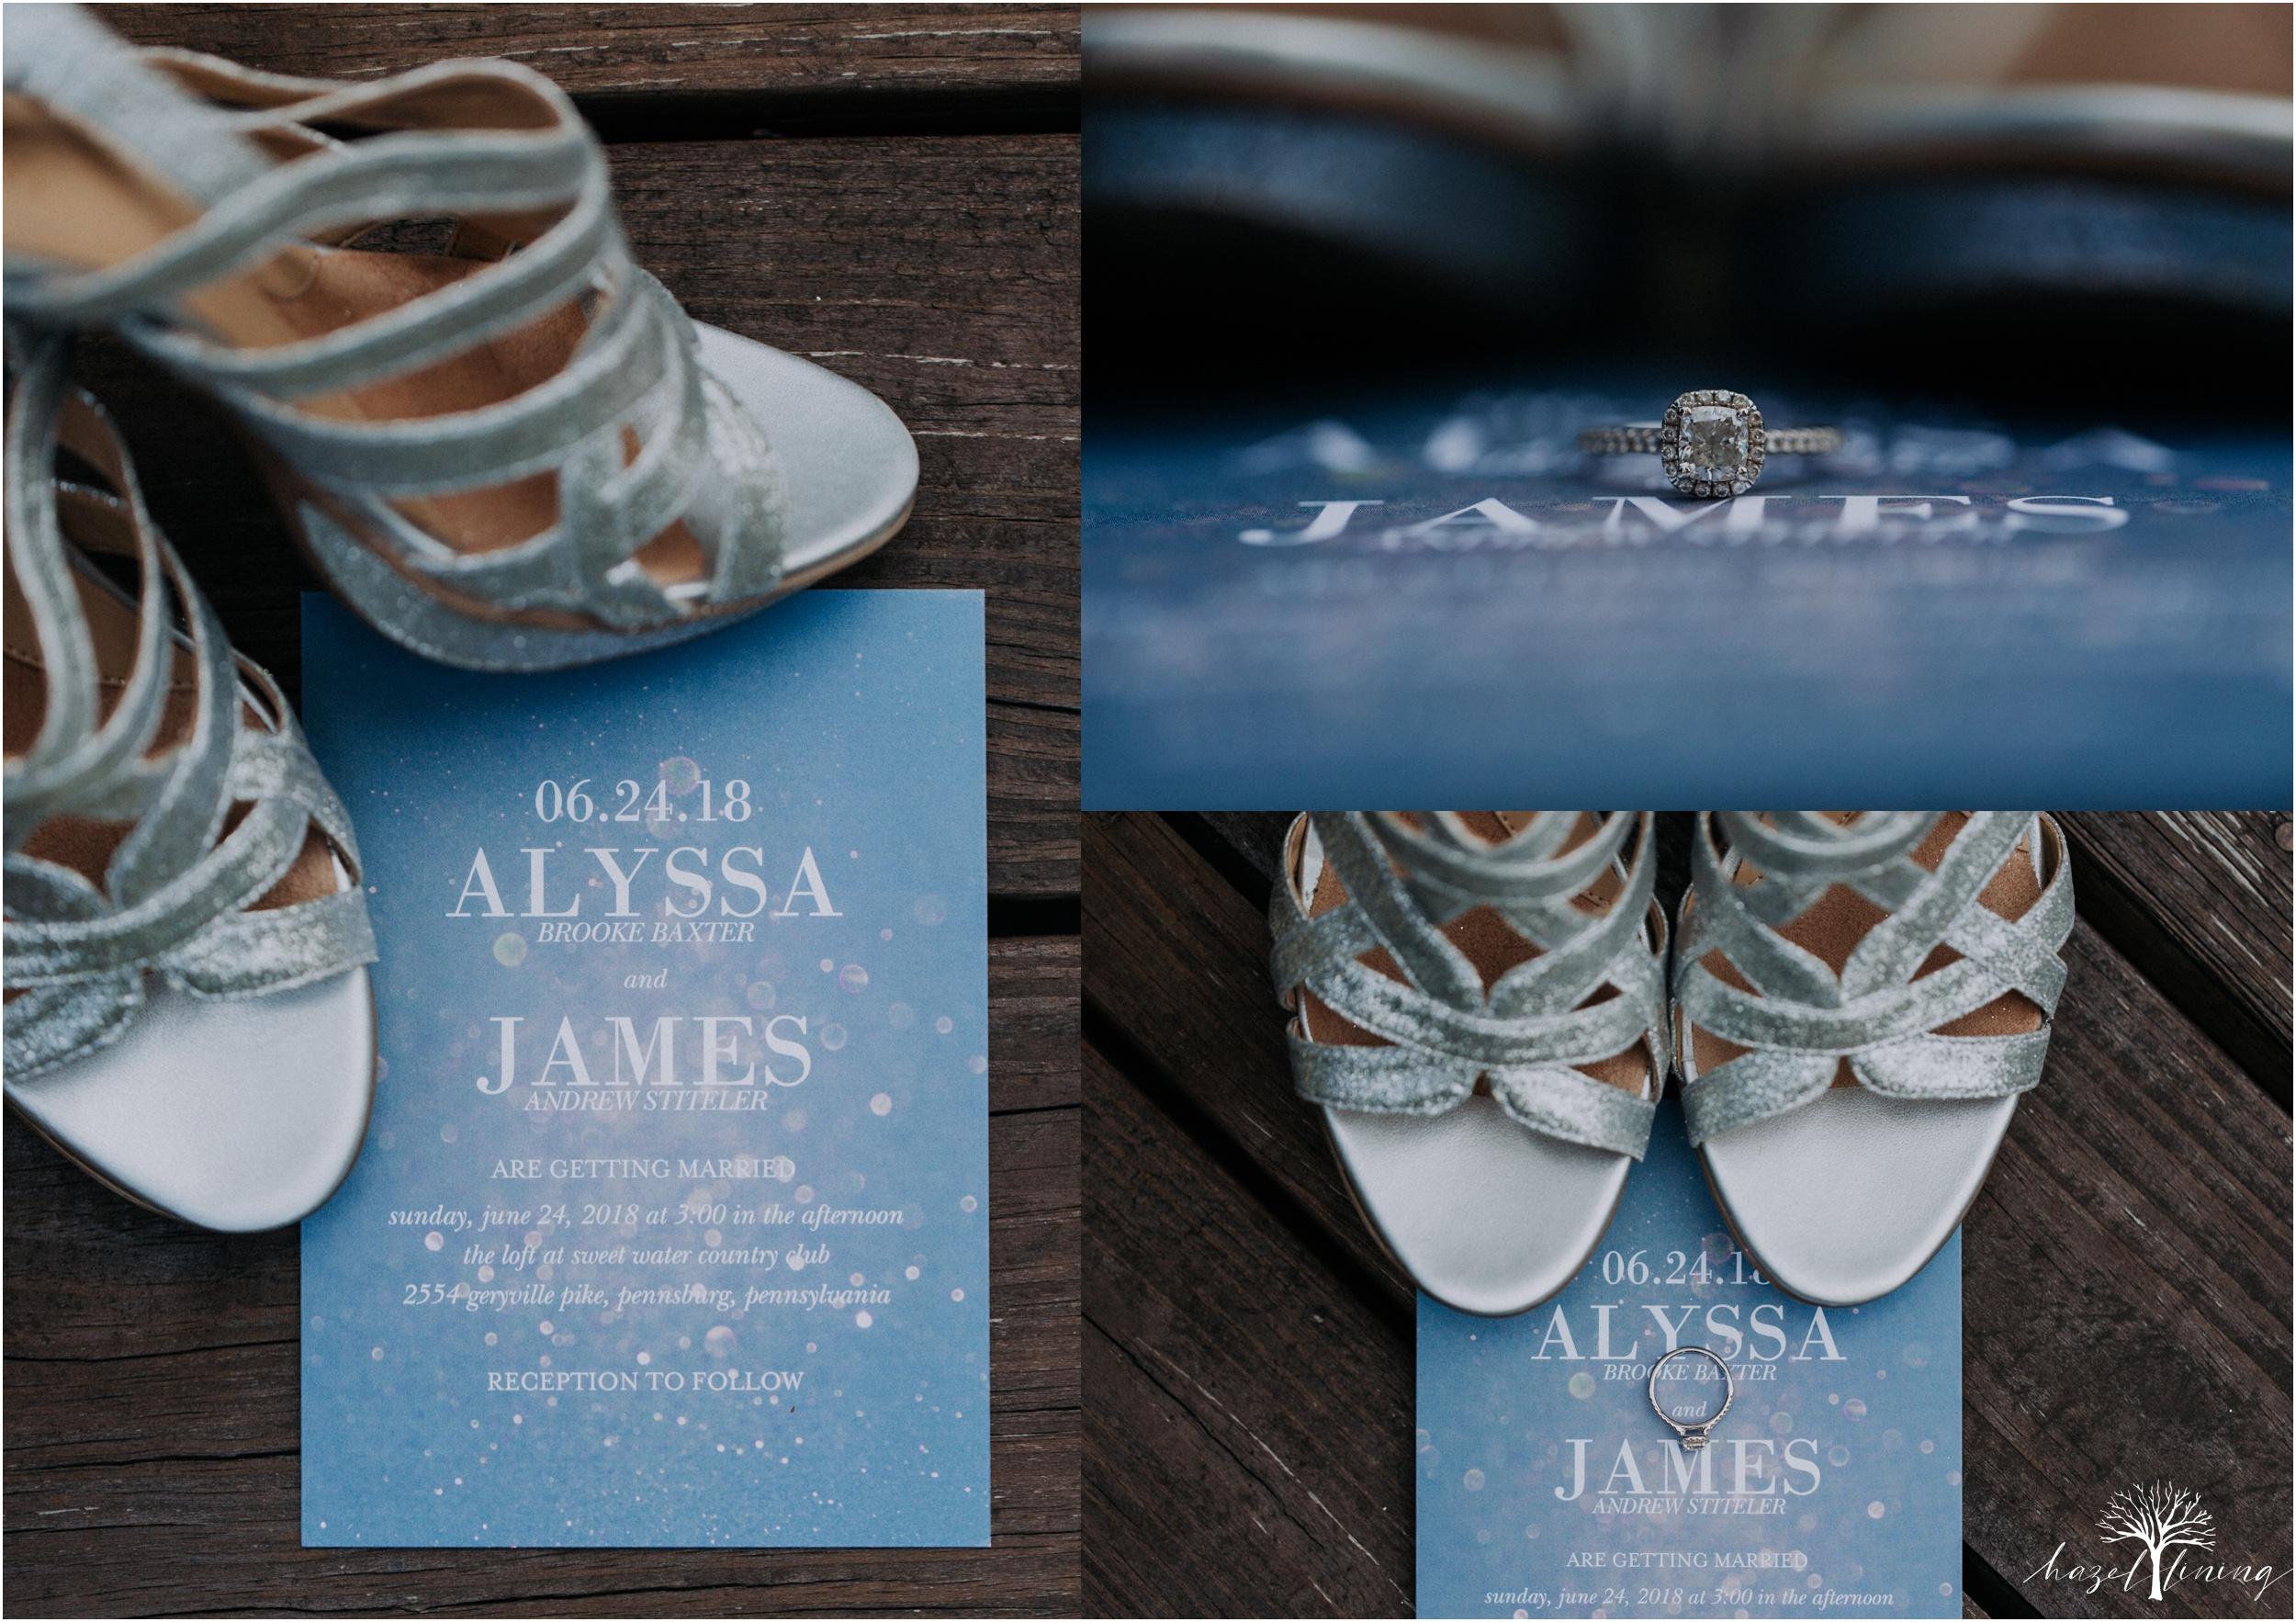 alyssa-james-stiteler-wedding-loft-and-sweet-water-cc-pennsburg-pennsylvania-hazel-lining-travel-wedding-elopement-photography_0015.jpg